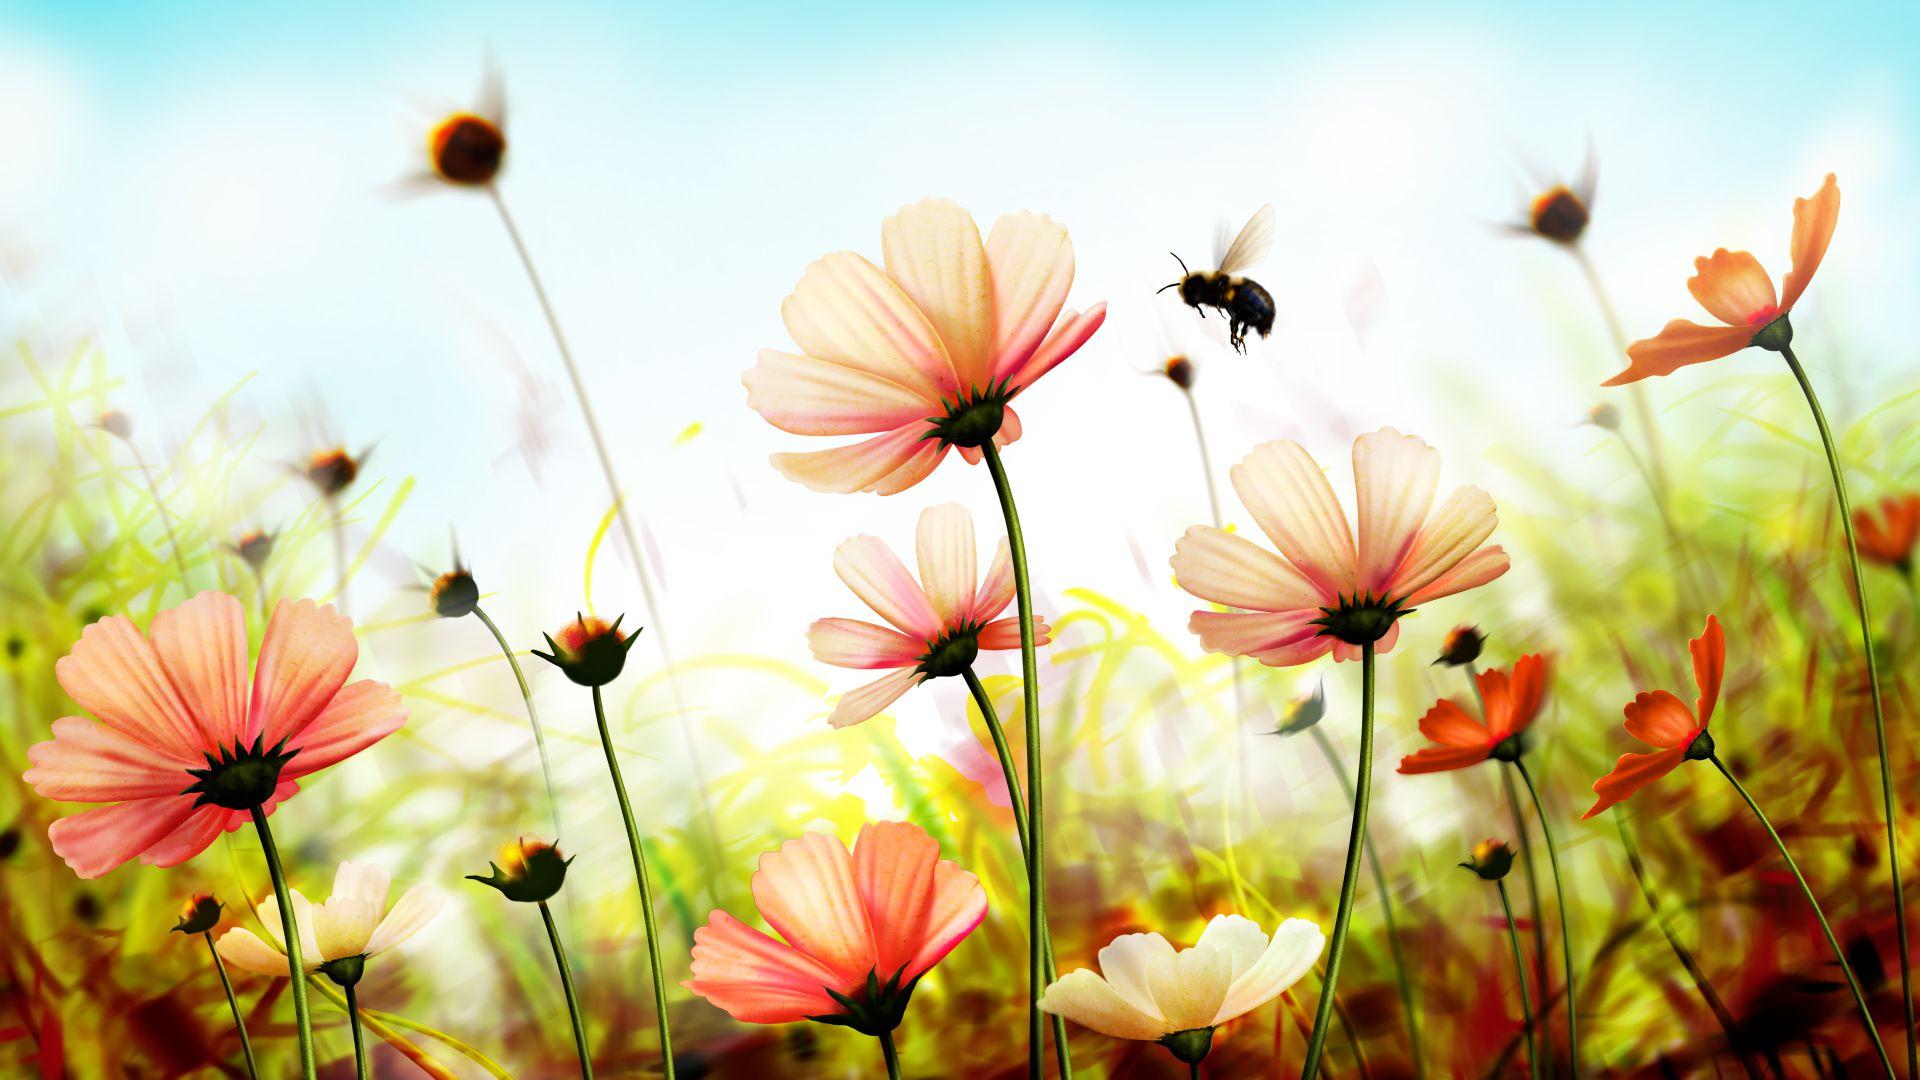 обои на рабочий стол весна лето цветы нее